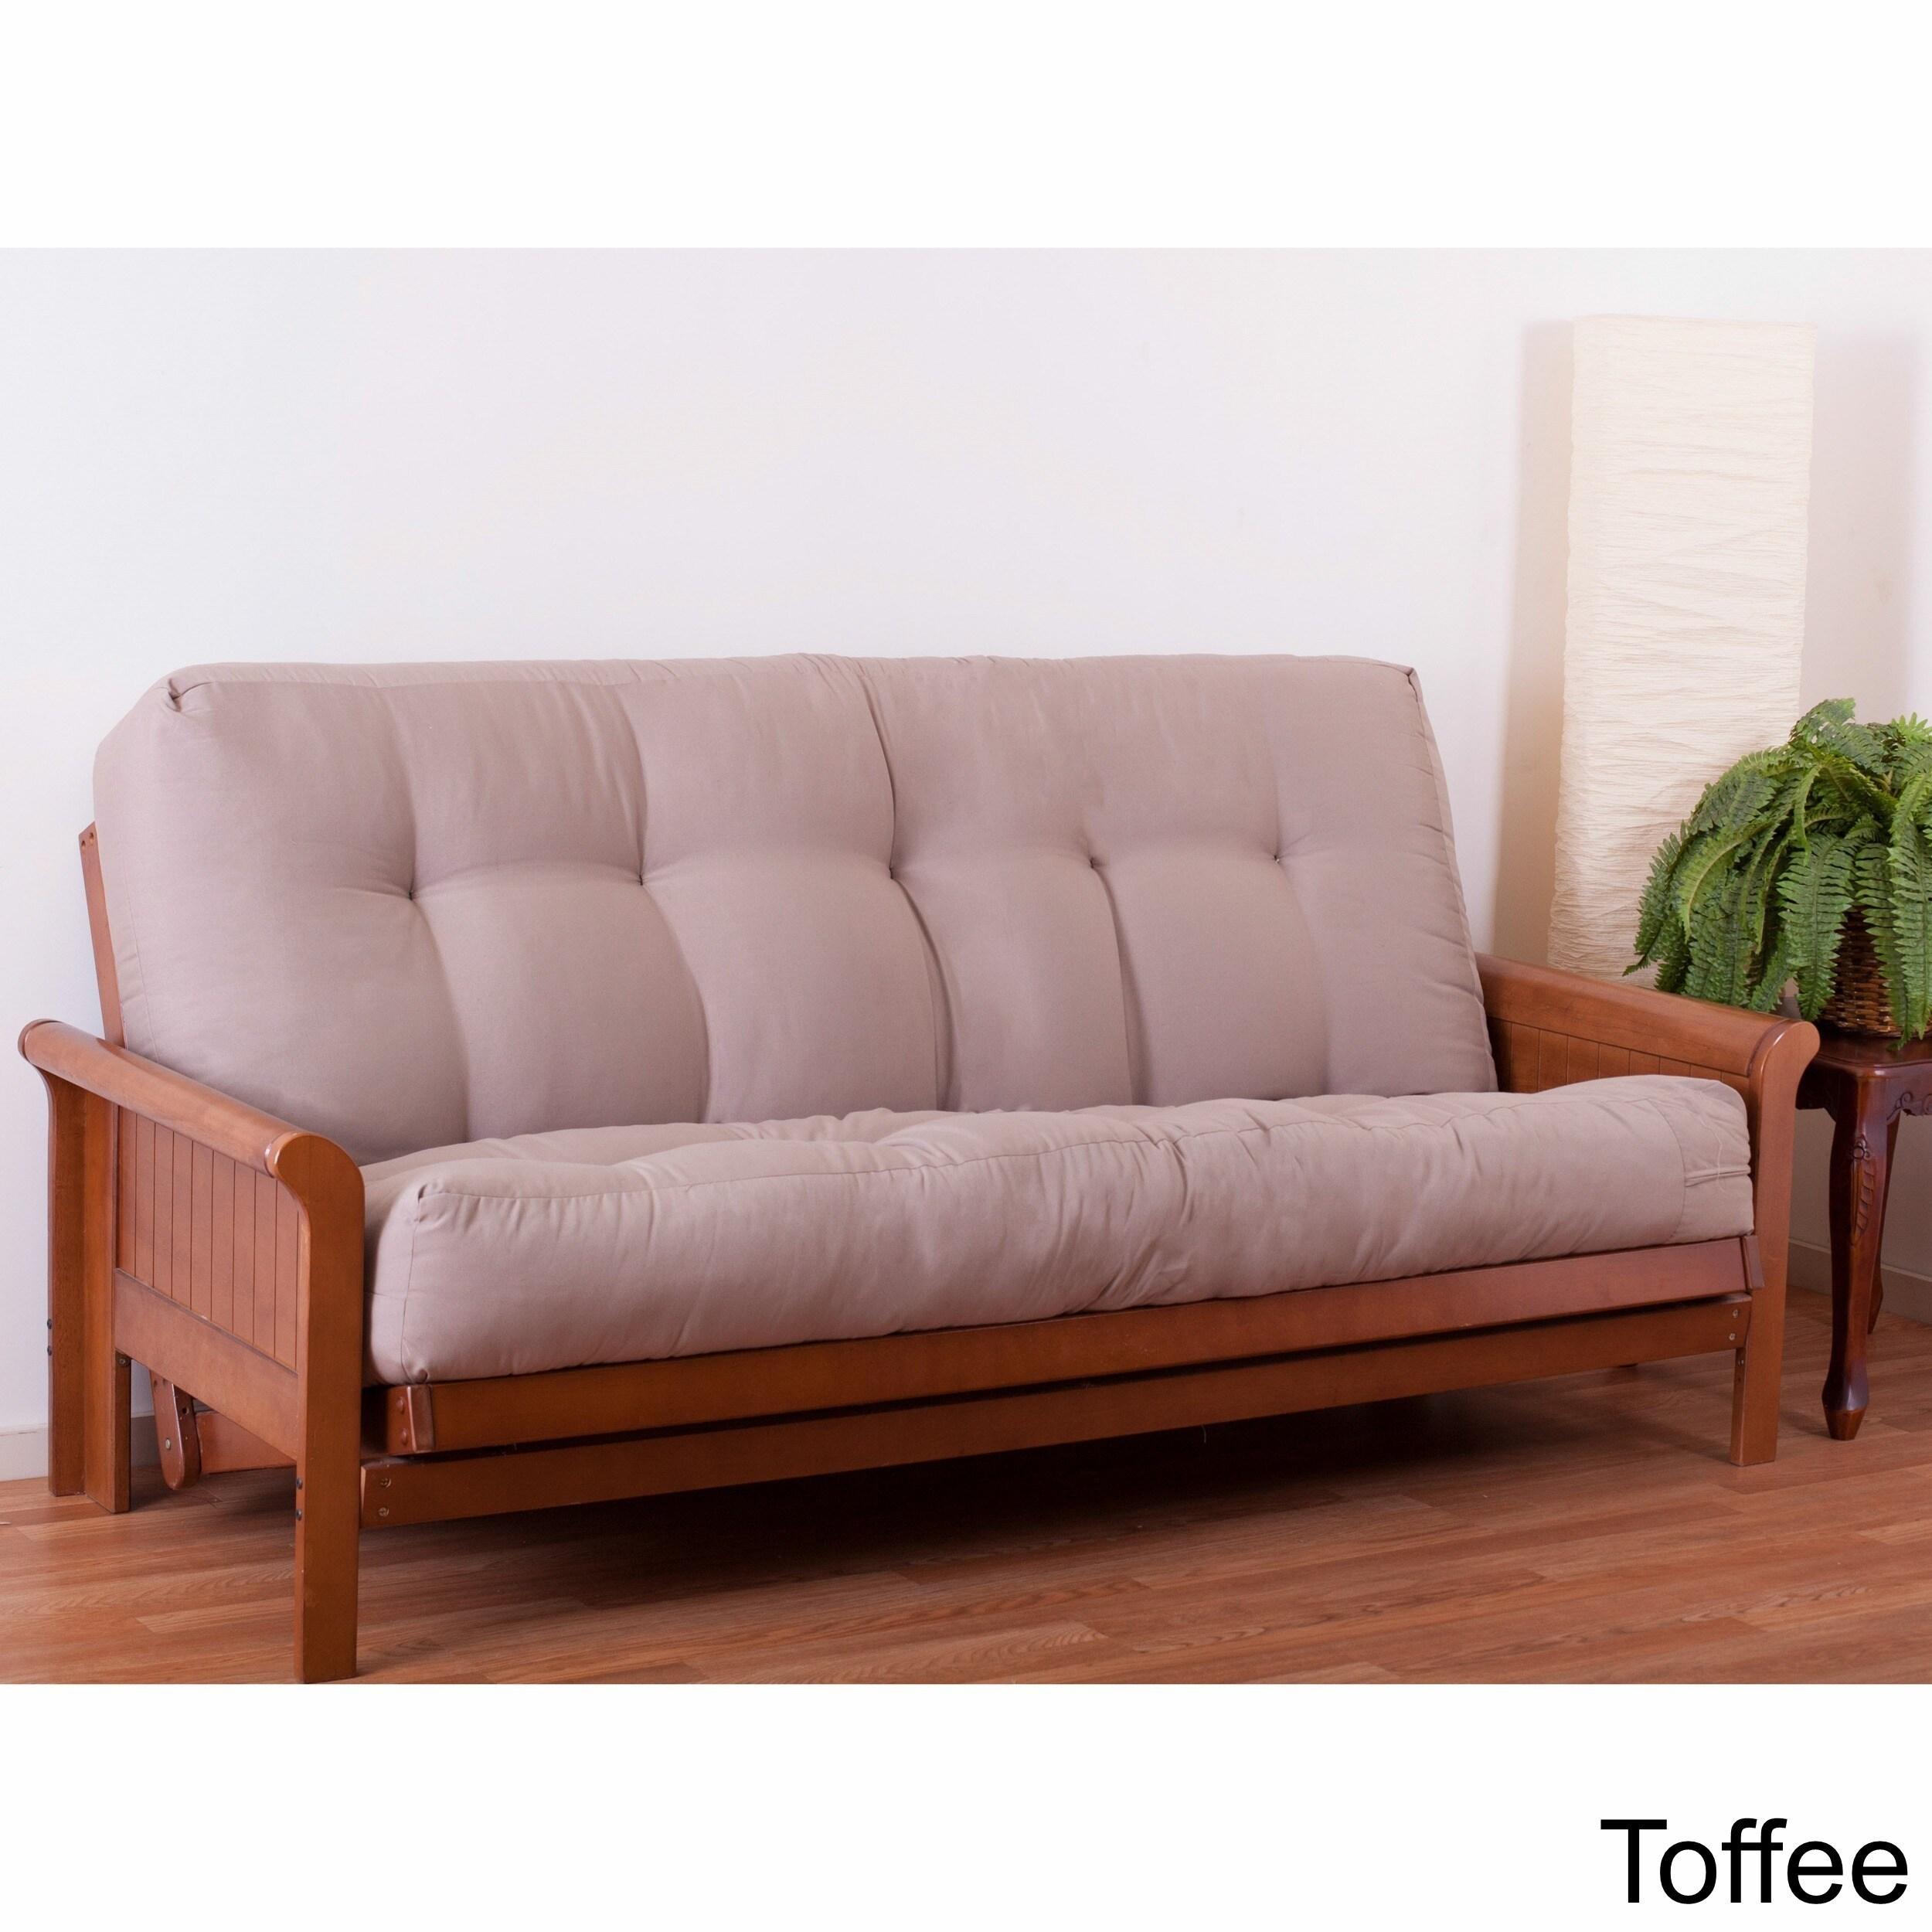 futon master pocketed hayneedle coil innerspring mattress furniture futons shop vancouver